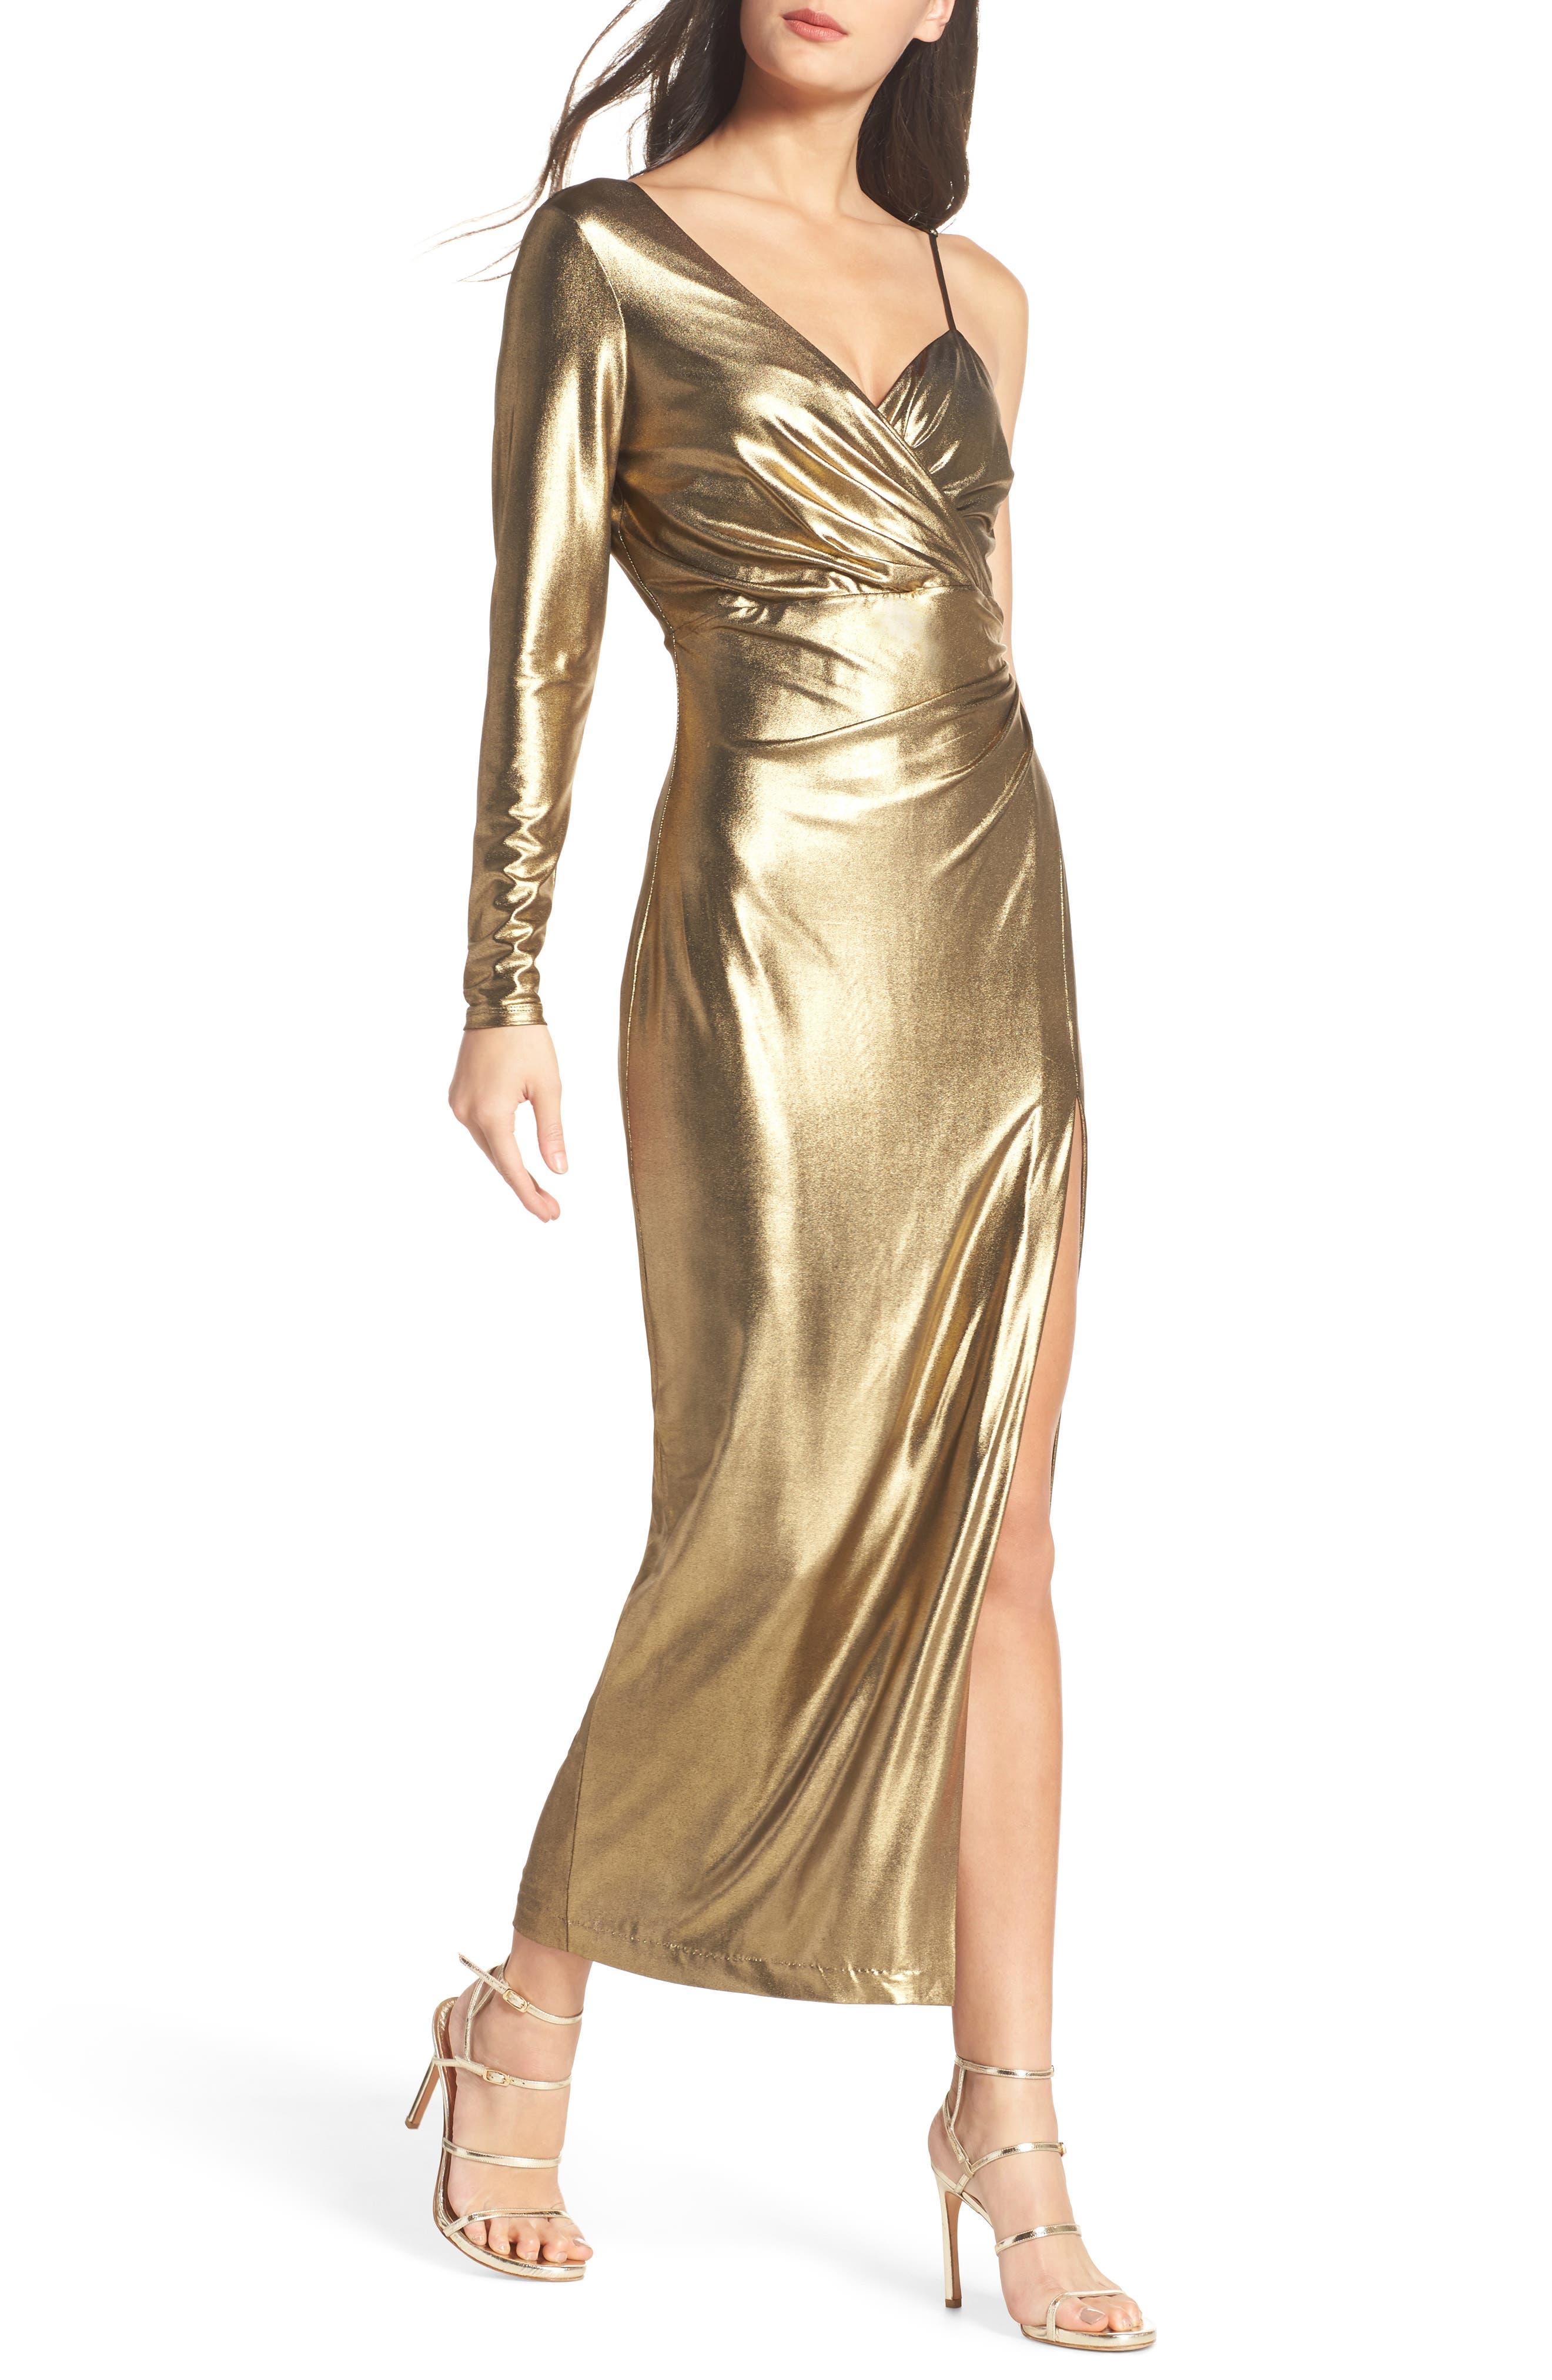 Alternate Image 1 Selected - Bardot Aurel Metallic Dress